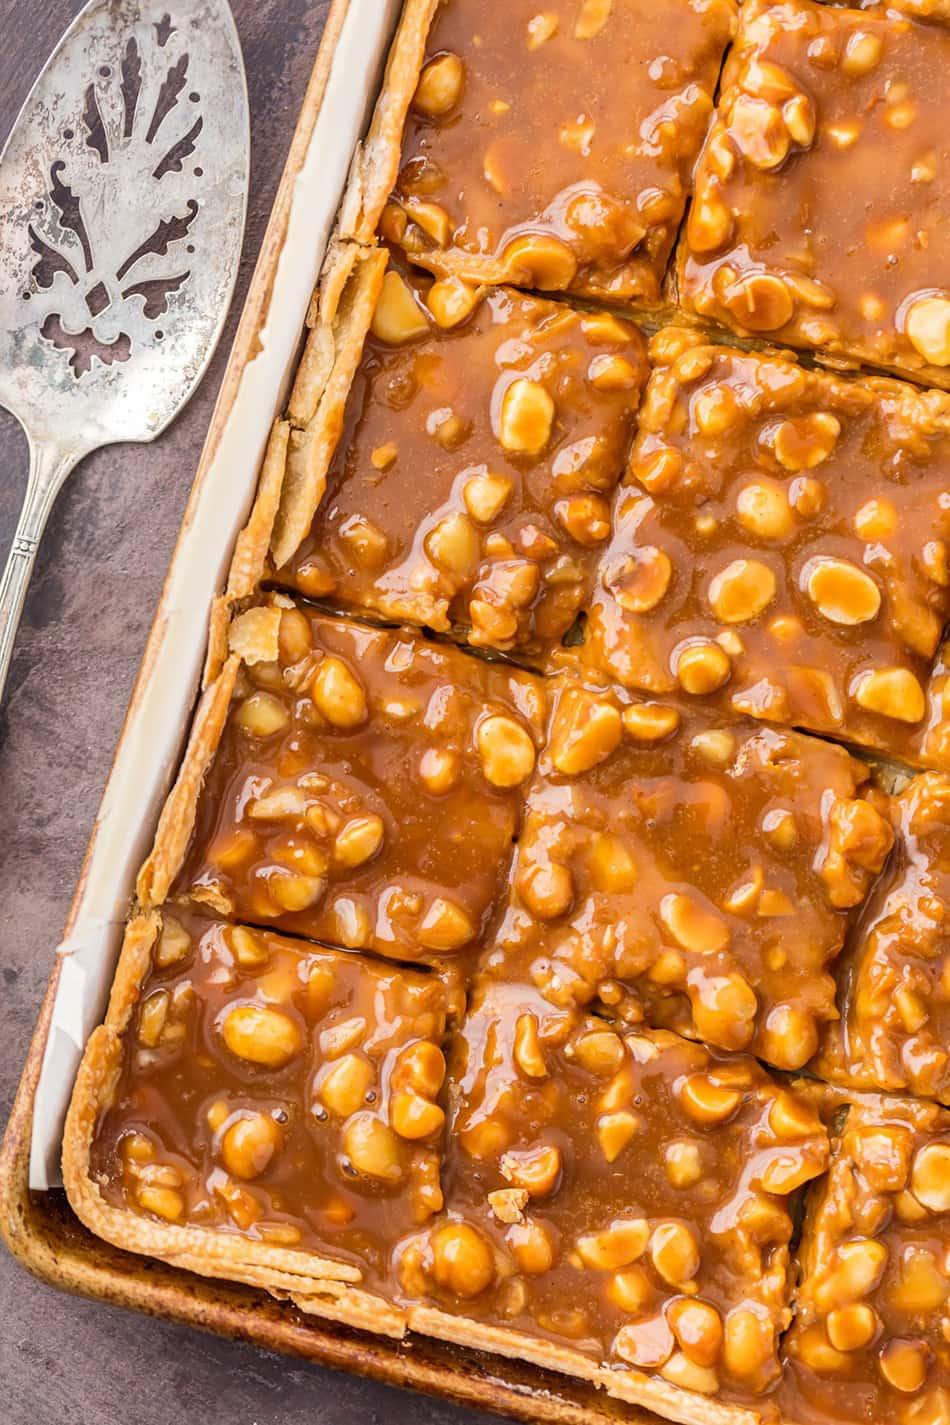 Caramel Macadamia Nut Pumpkin Pie Bars | The Cookie Rookie